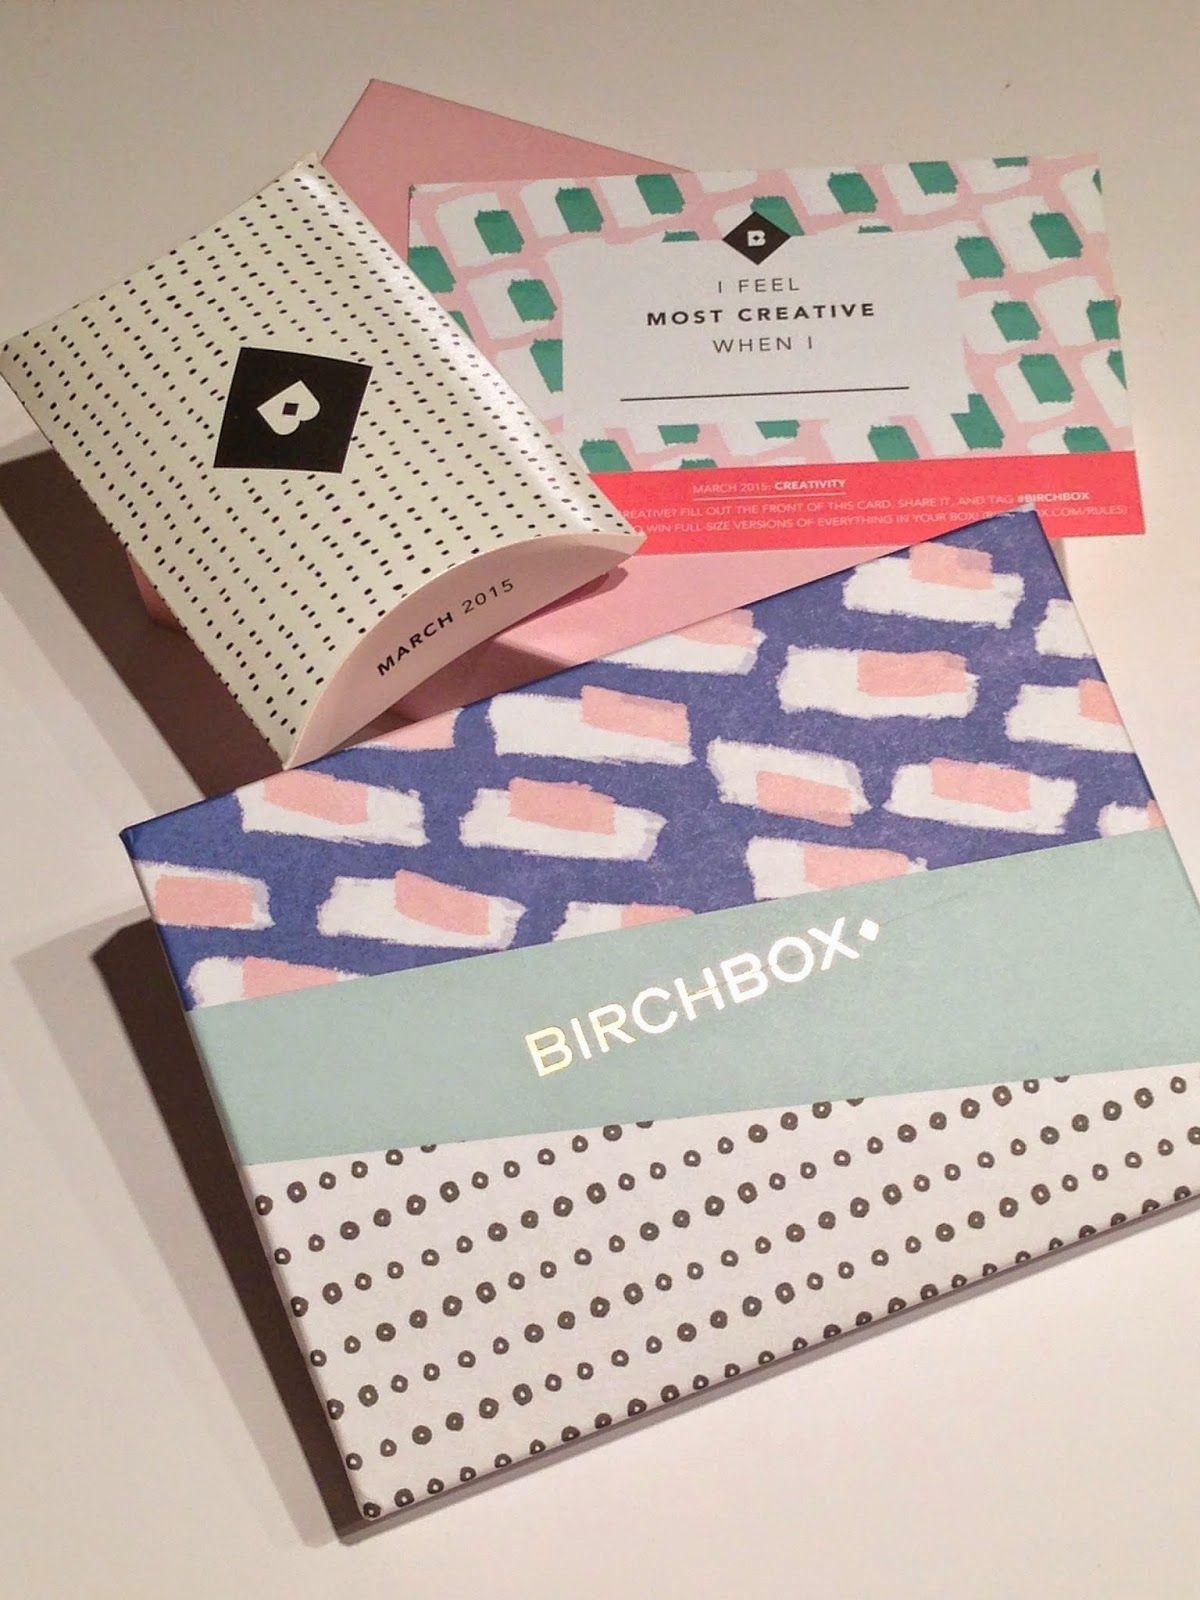 Birchbox Subscription Box Review March 2015 Birch box